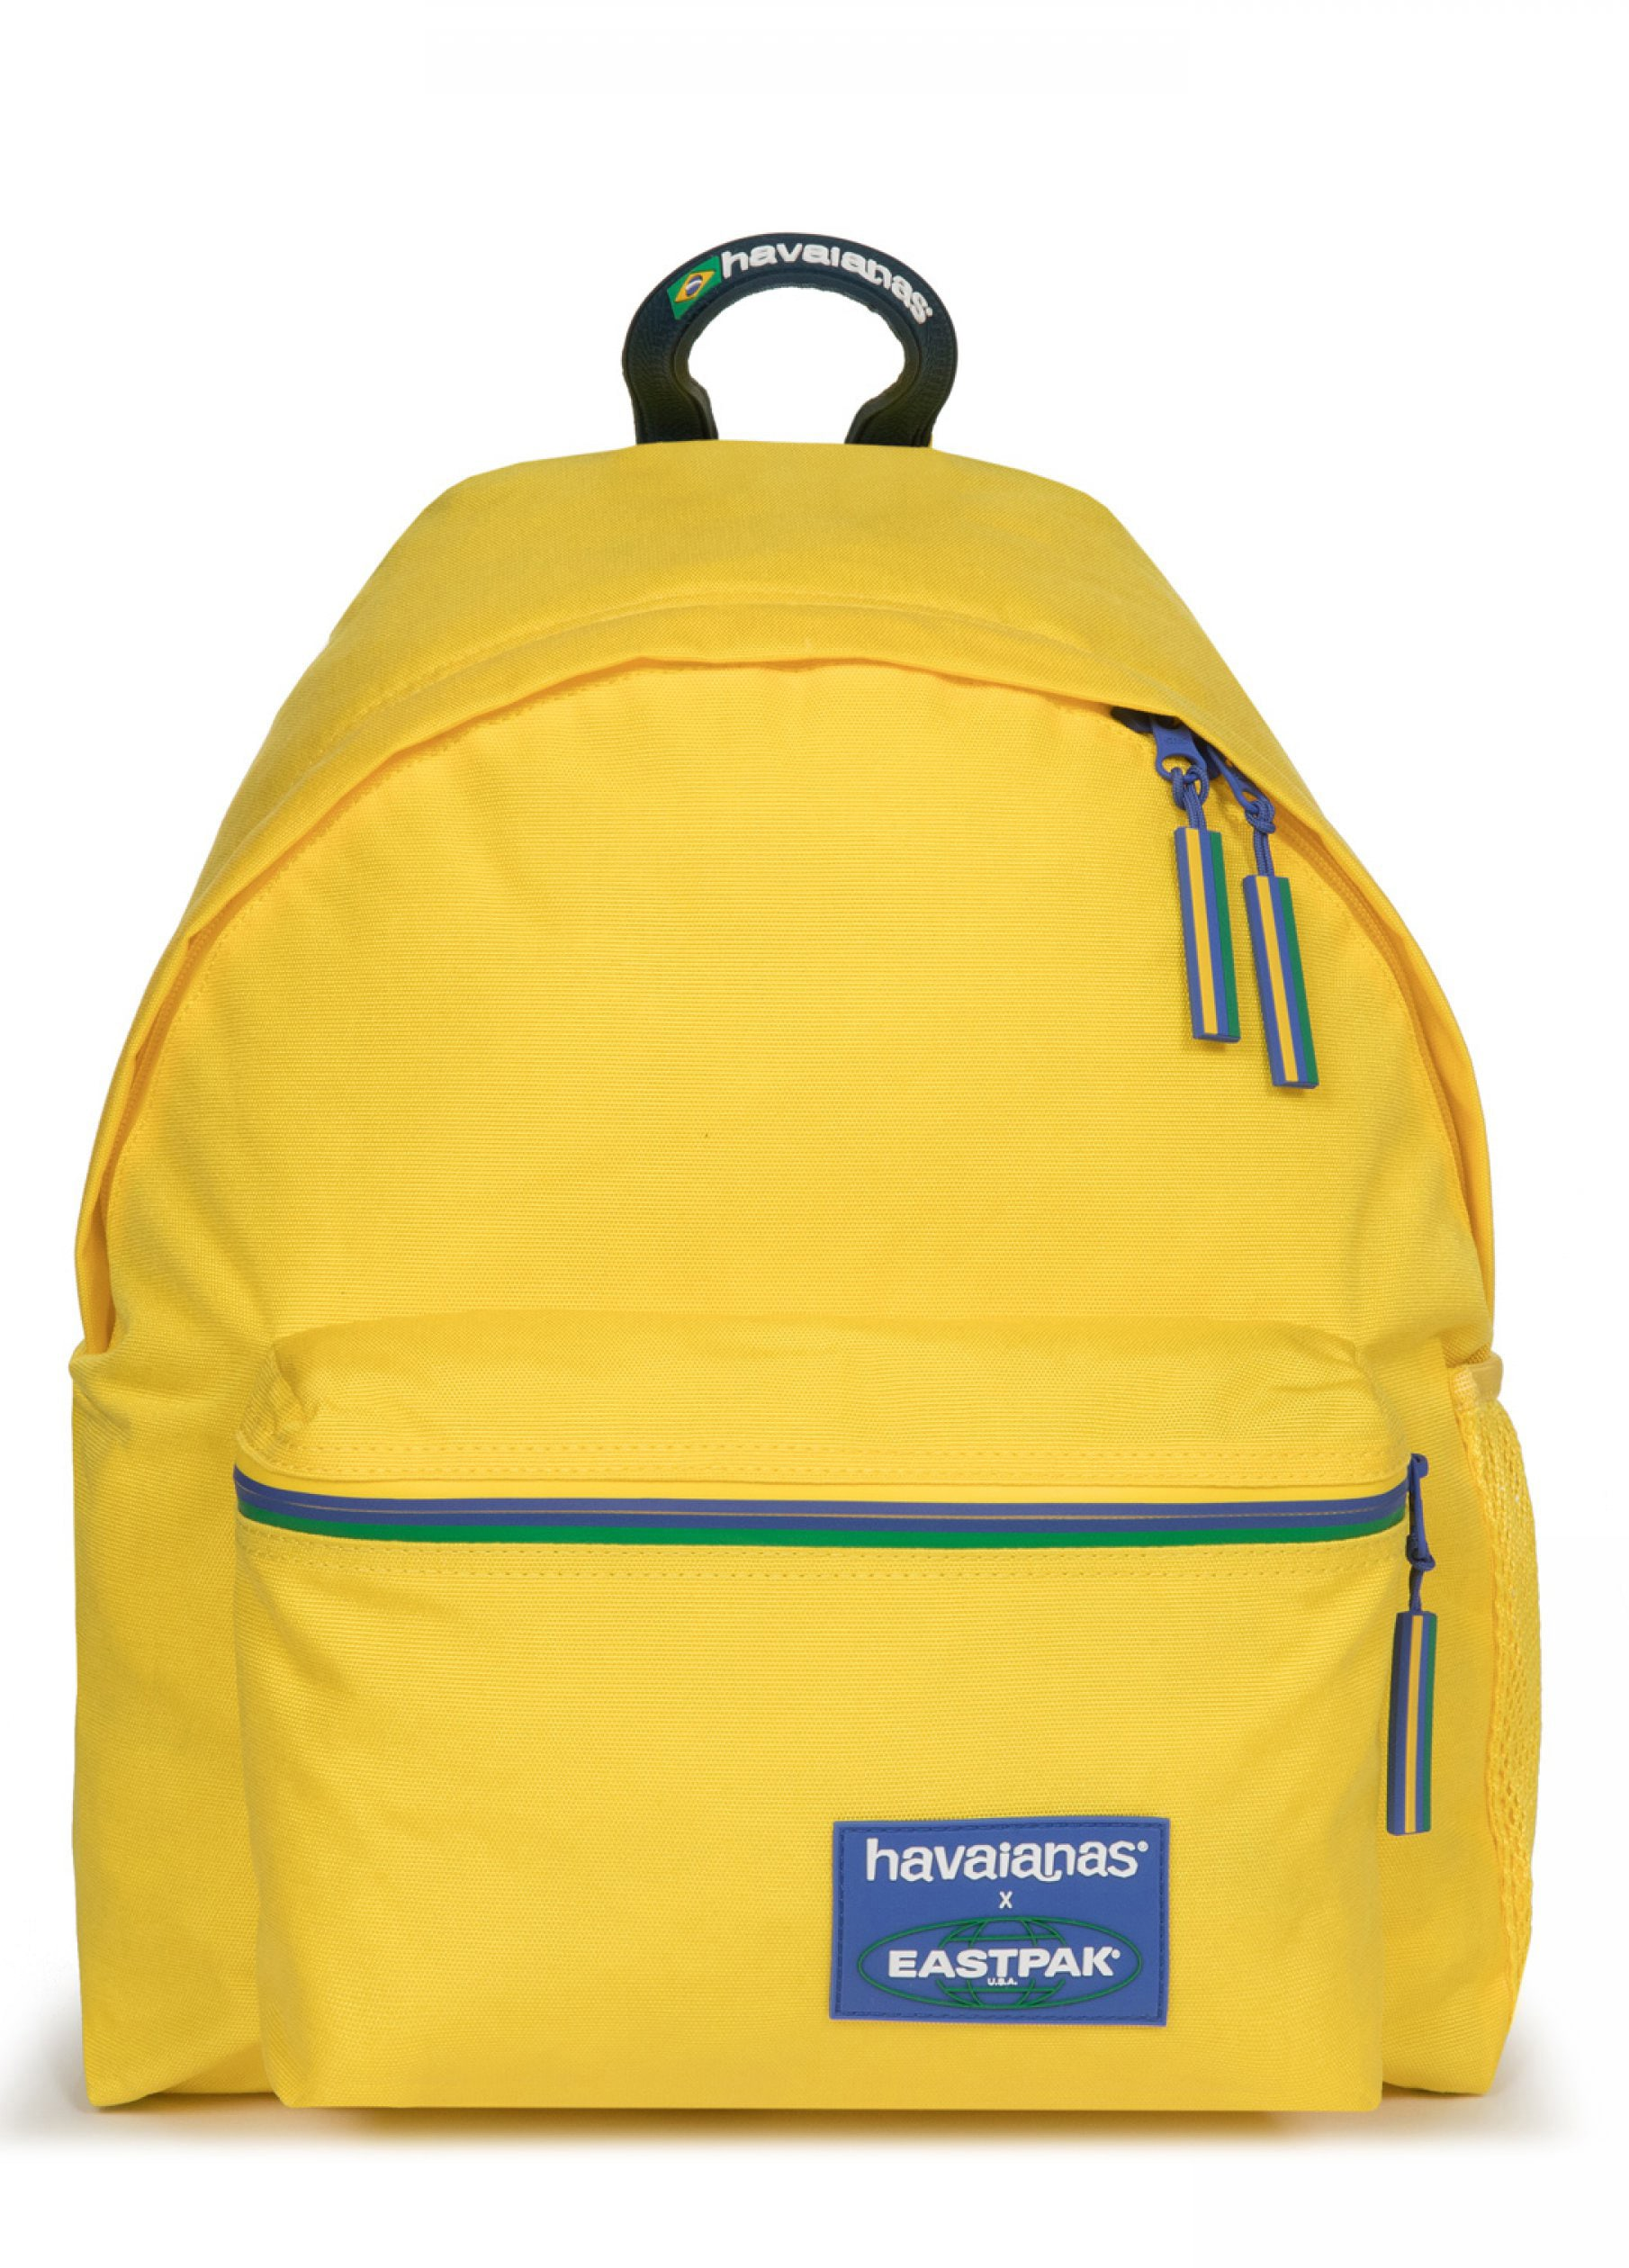 Eastpak Freizeitrucksack Eastpak x Havaianas - PADDED PAK'R havaianas yellow, gelb, Kinder